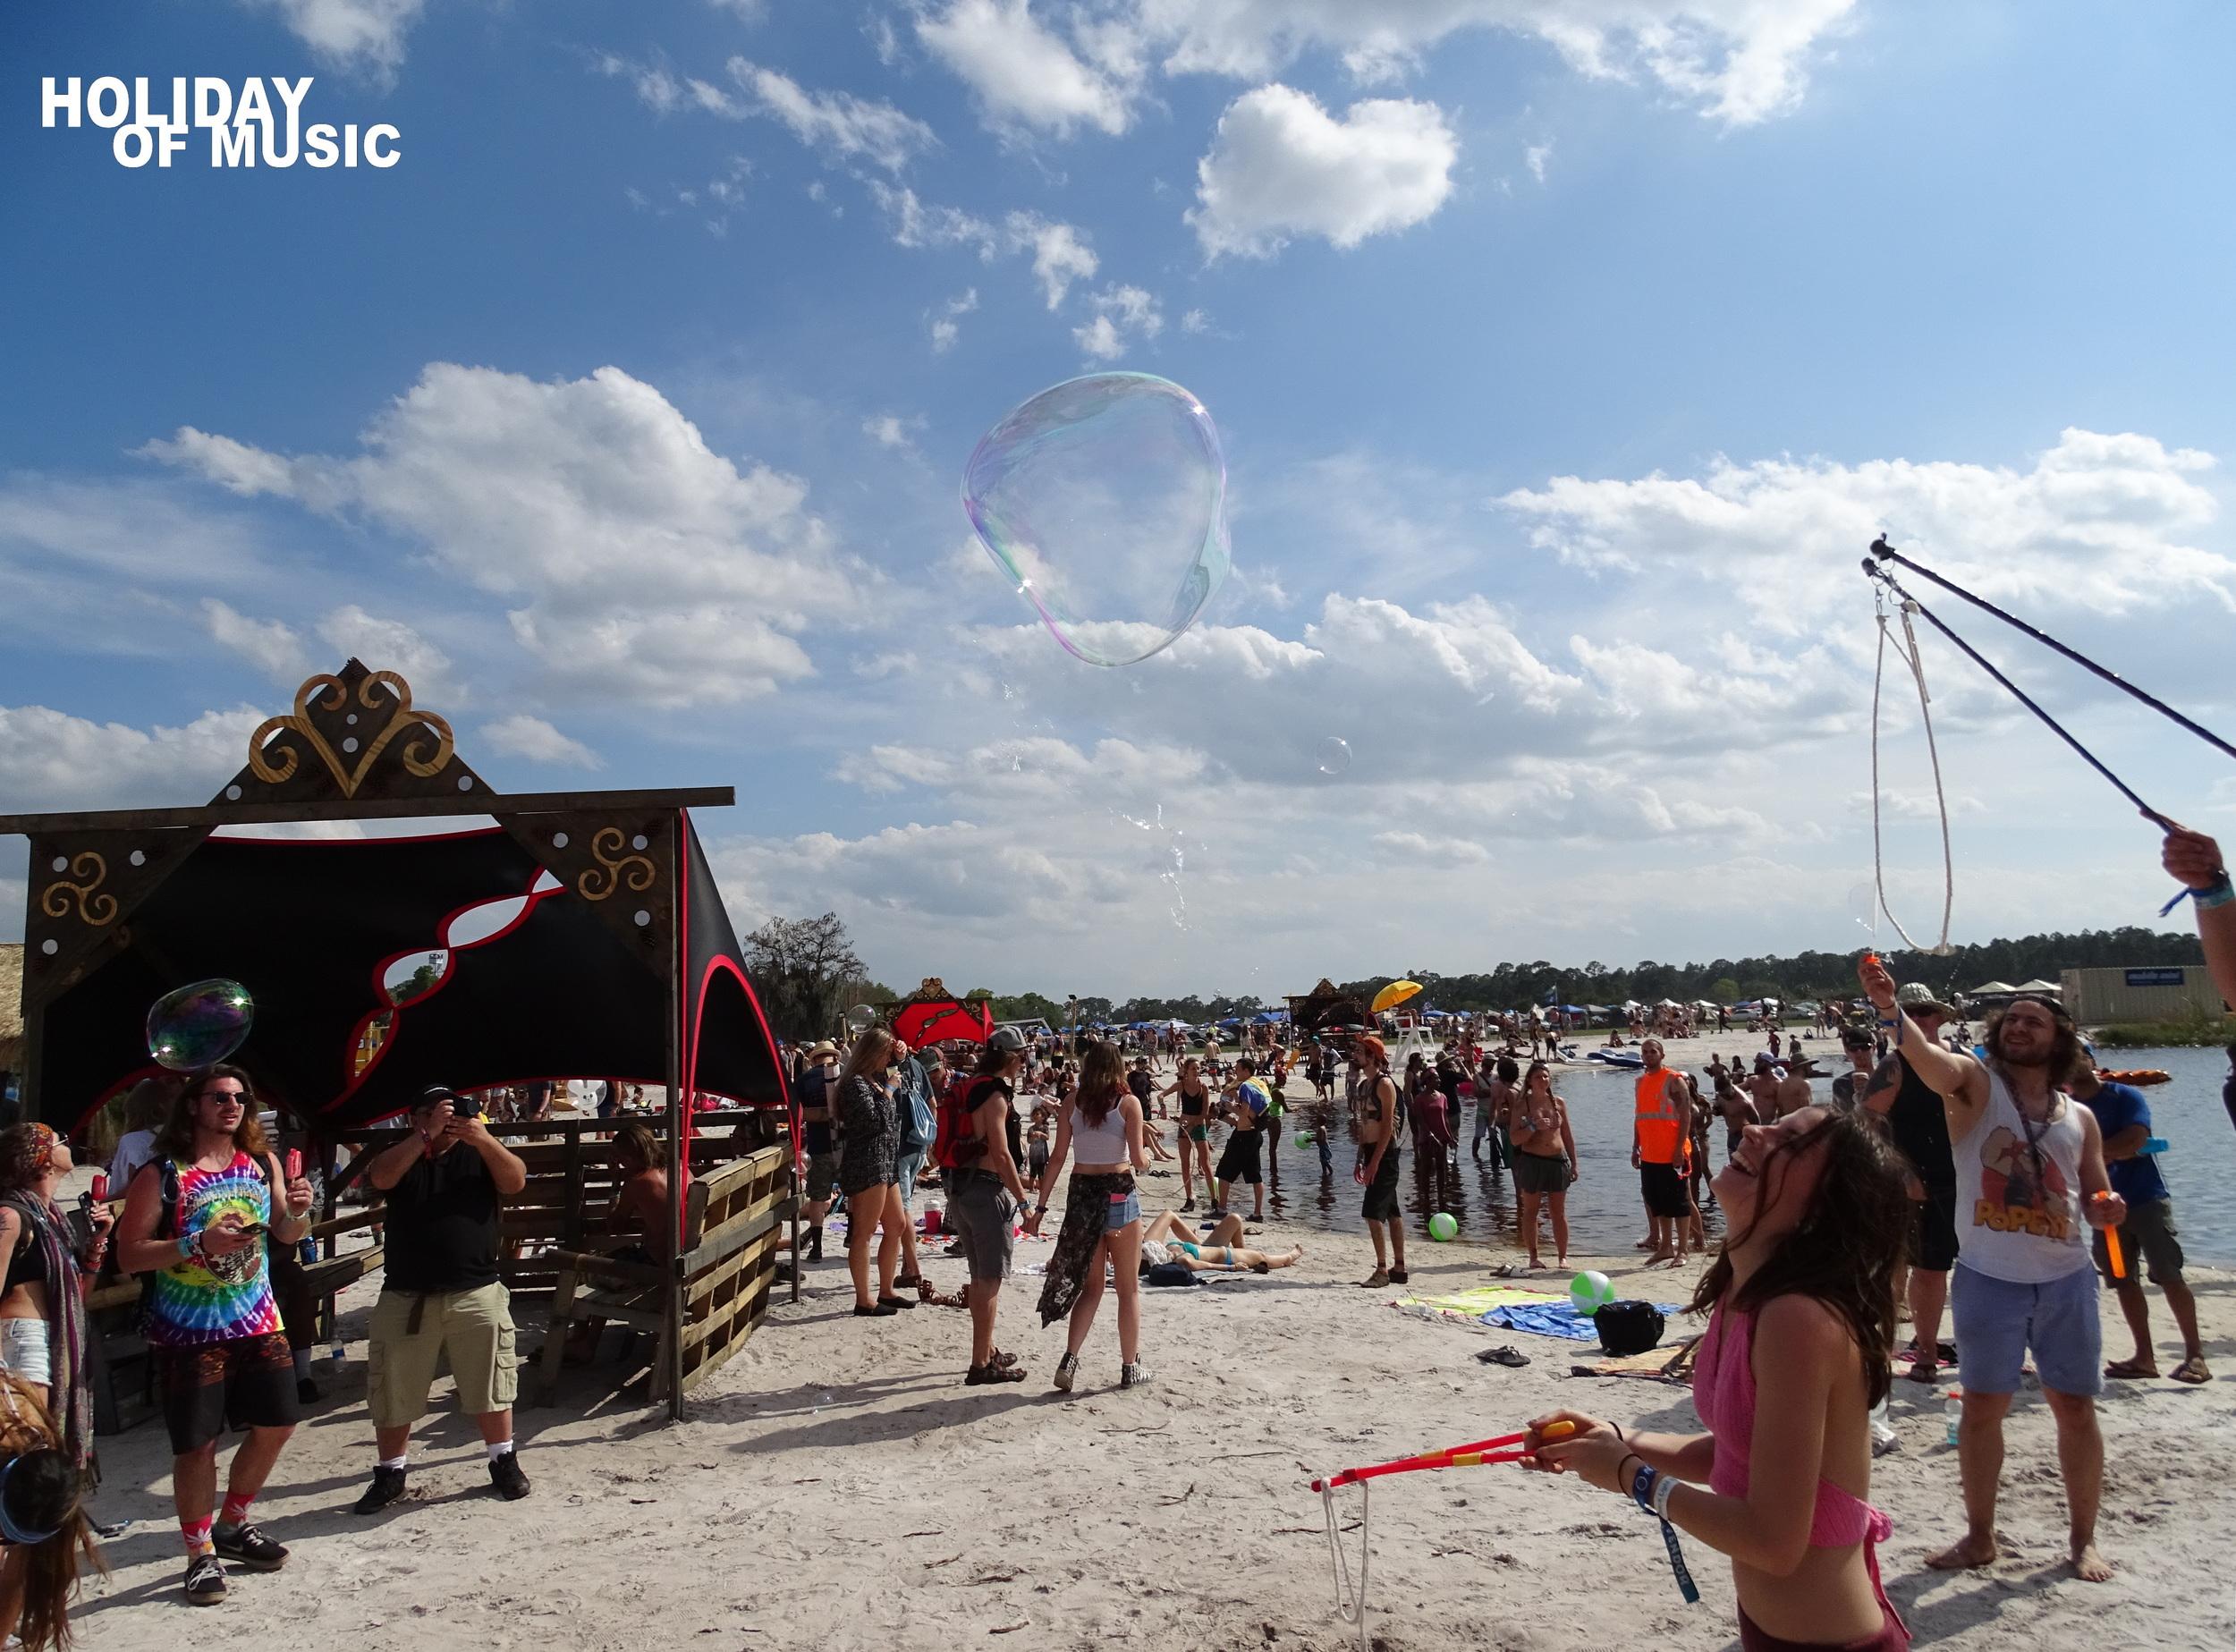 Aquachobee Beach - Okeechobee Music & Arts Festival